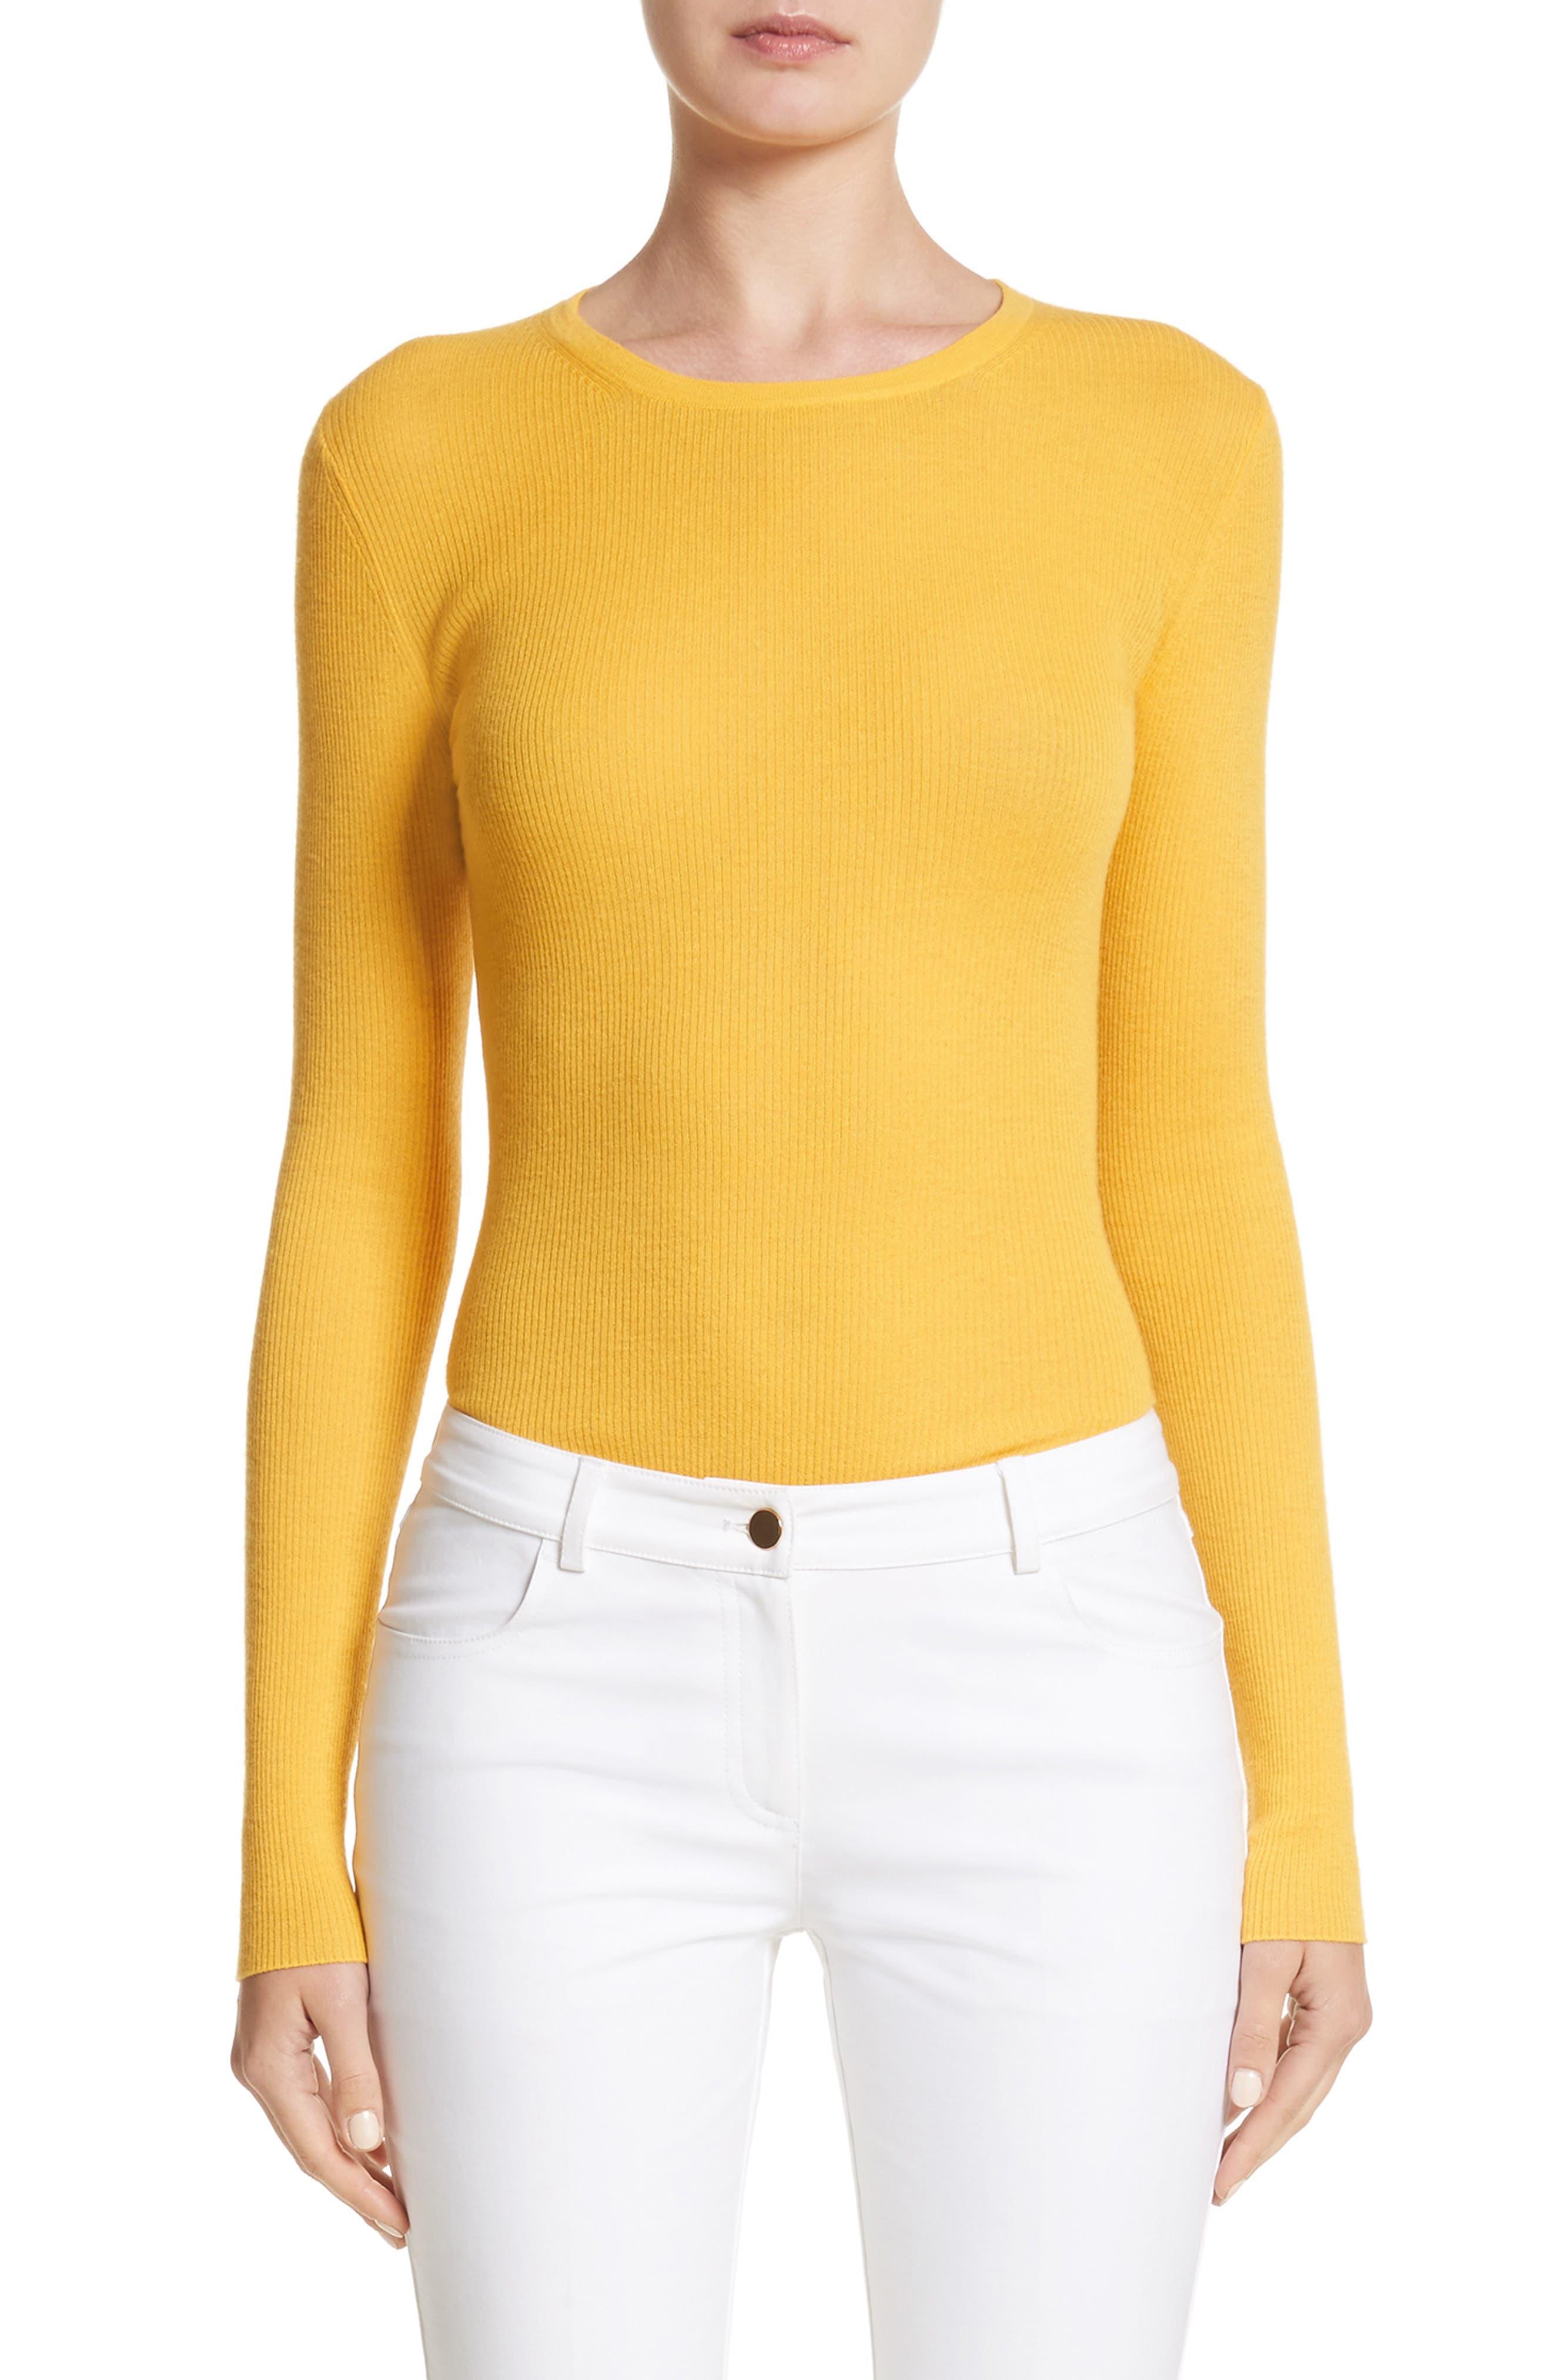 Main Image - Michael Kors Cashmere Crewneck Sweater